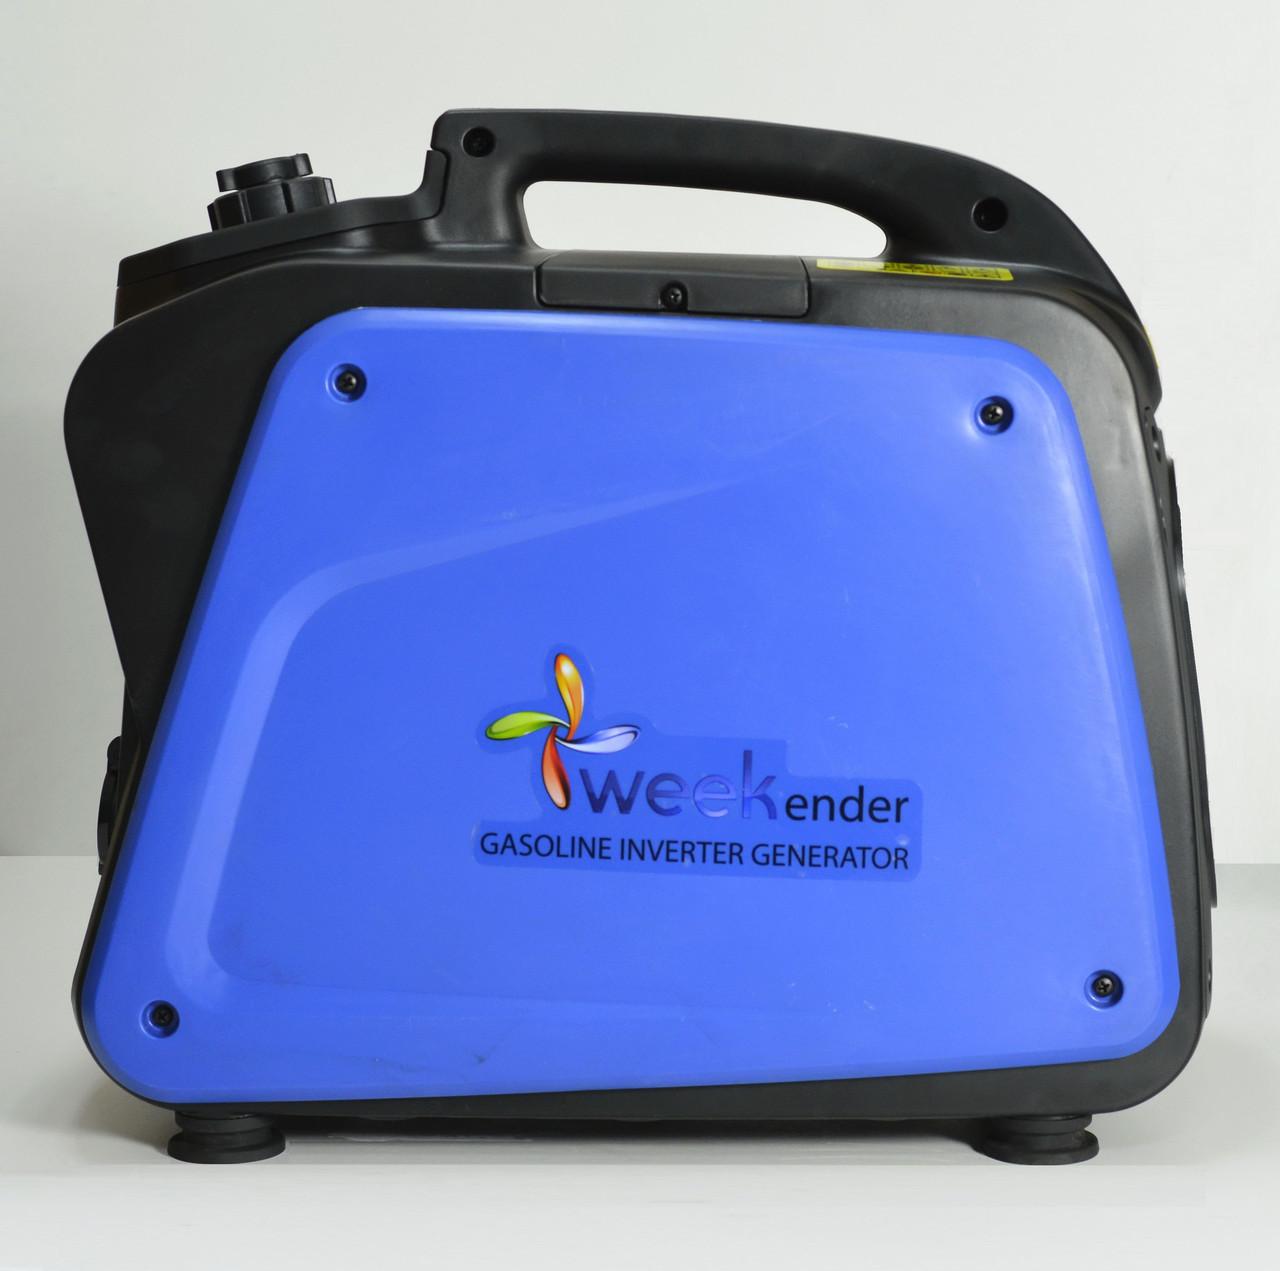 Генератор-инвертор Weekender (X2000i)